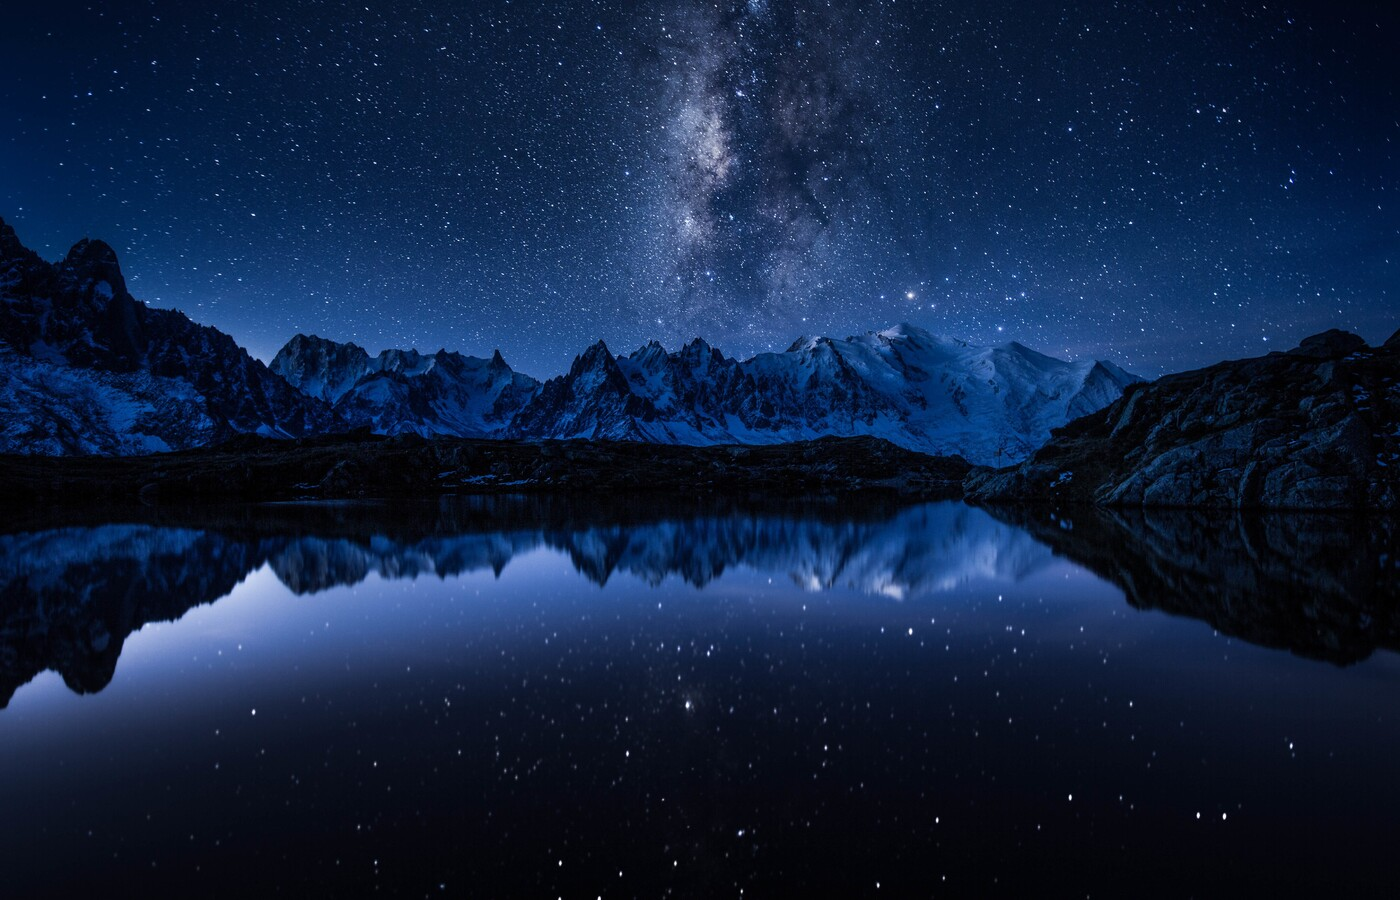 1400x900 Milky Way 5k 1400x900 Resolution Hd 4k Wallpapers